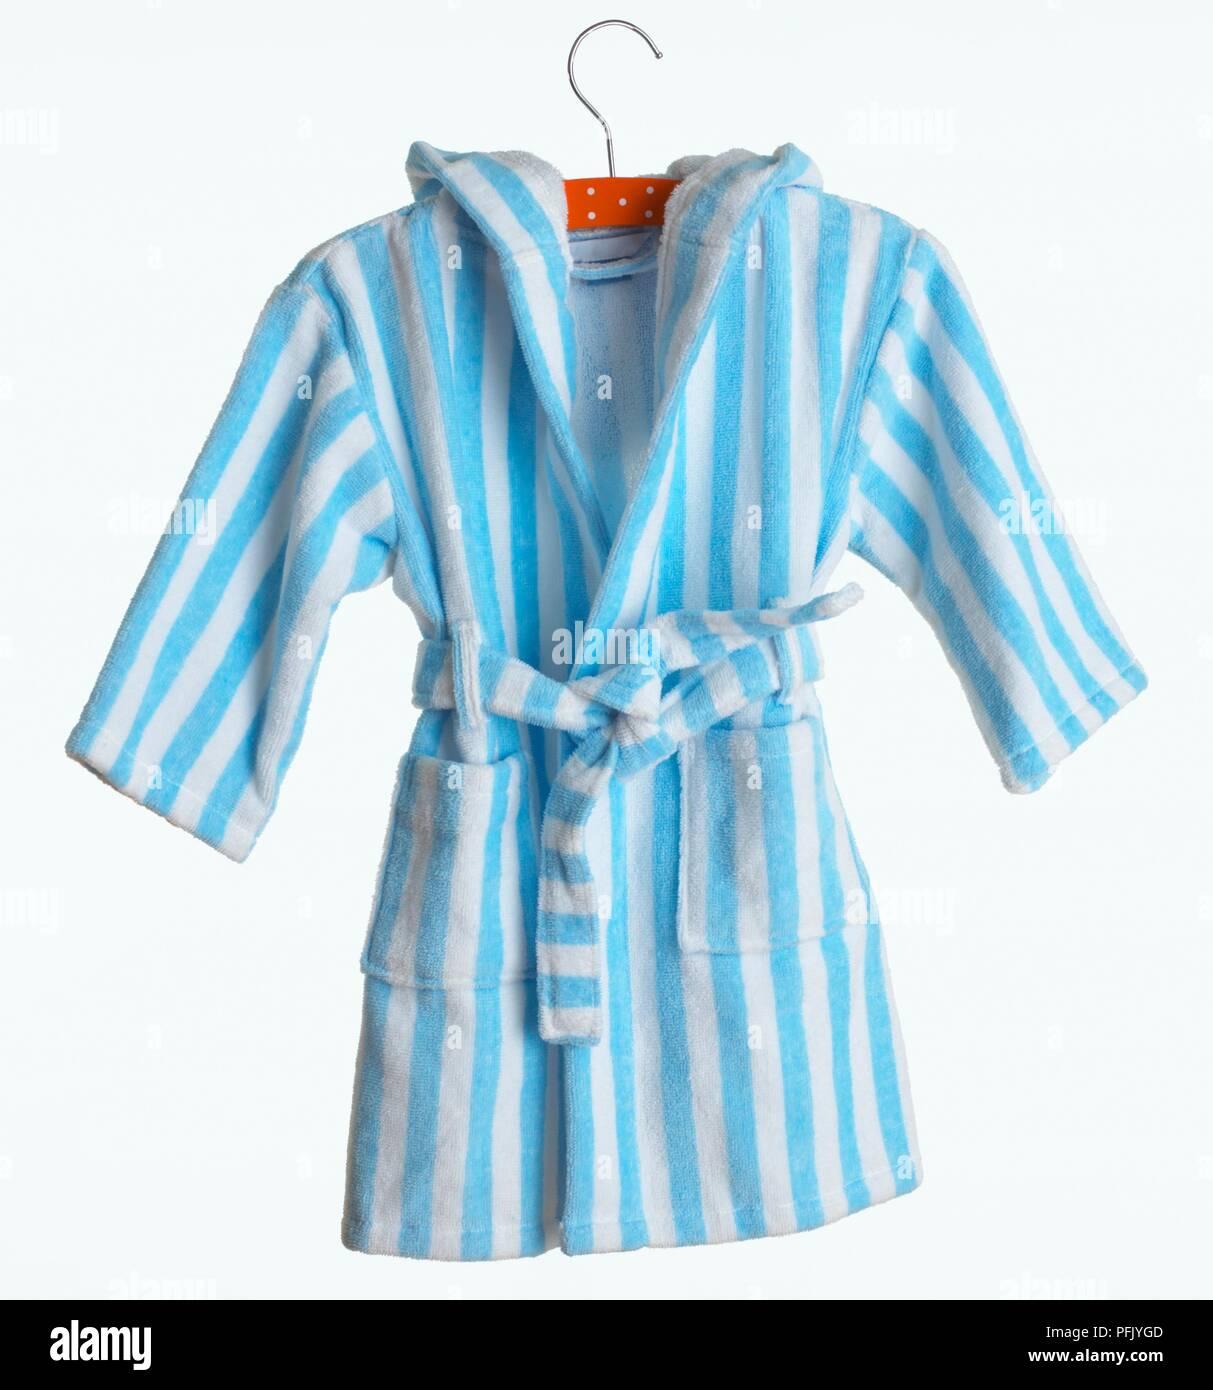 Blue And White Striped Child S Bathrobe On Hanger Stock Photo Alamy